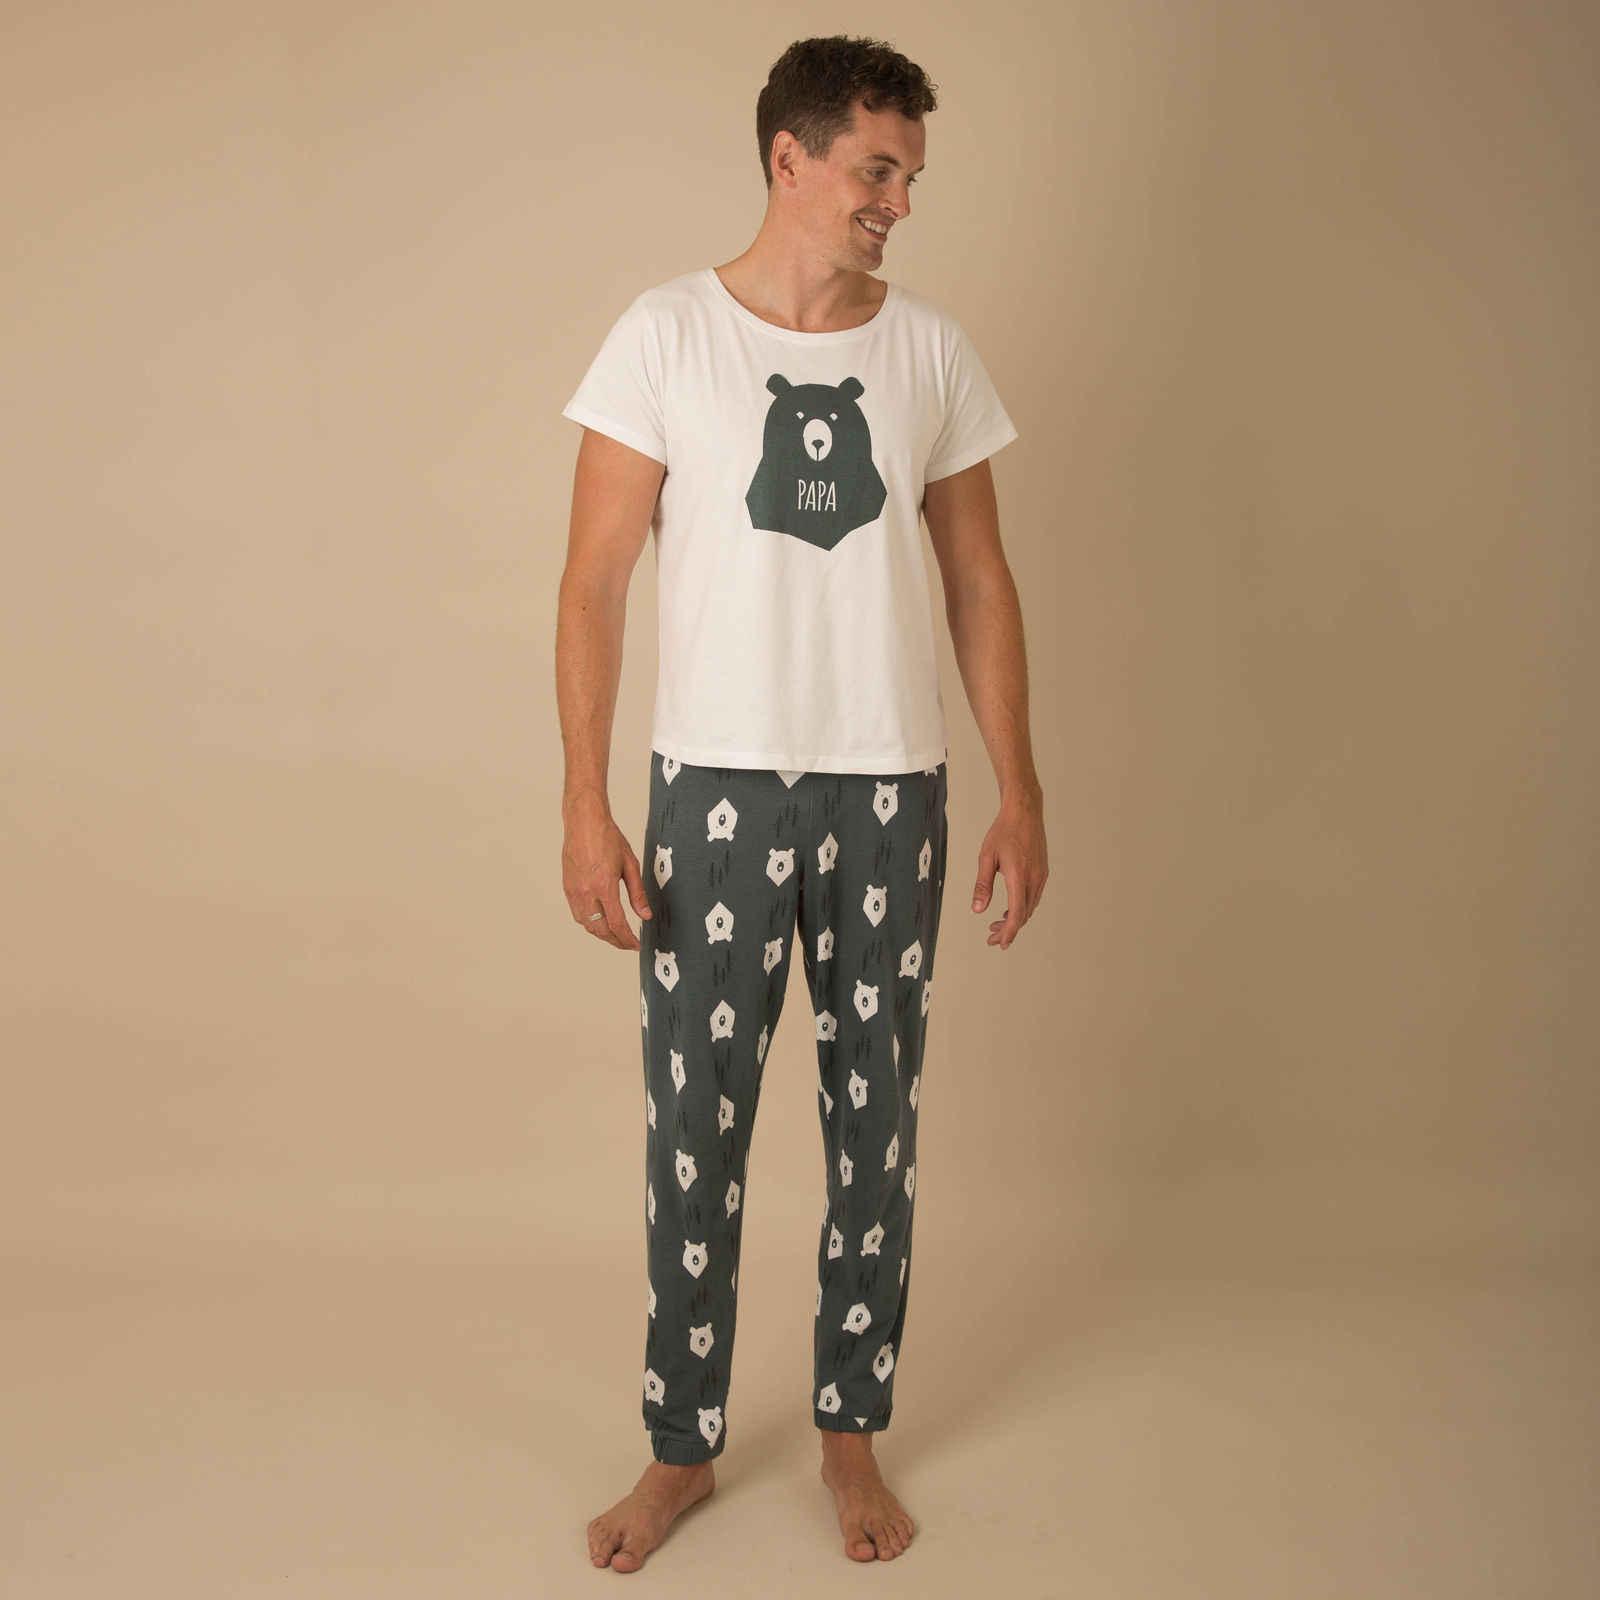 ... Winter Warm Christmas Bear Printing Pyjamas Matching Family PJs  Nightwear Adult Mum Dad Kid ... 465859141